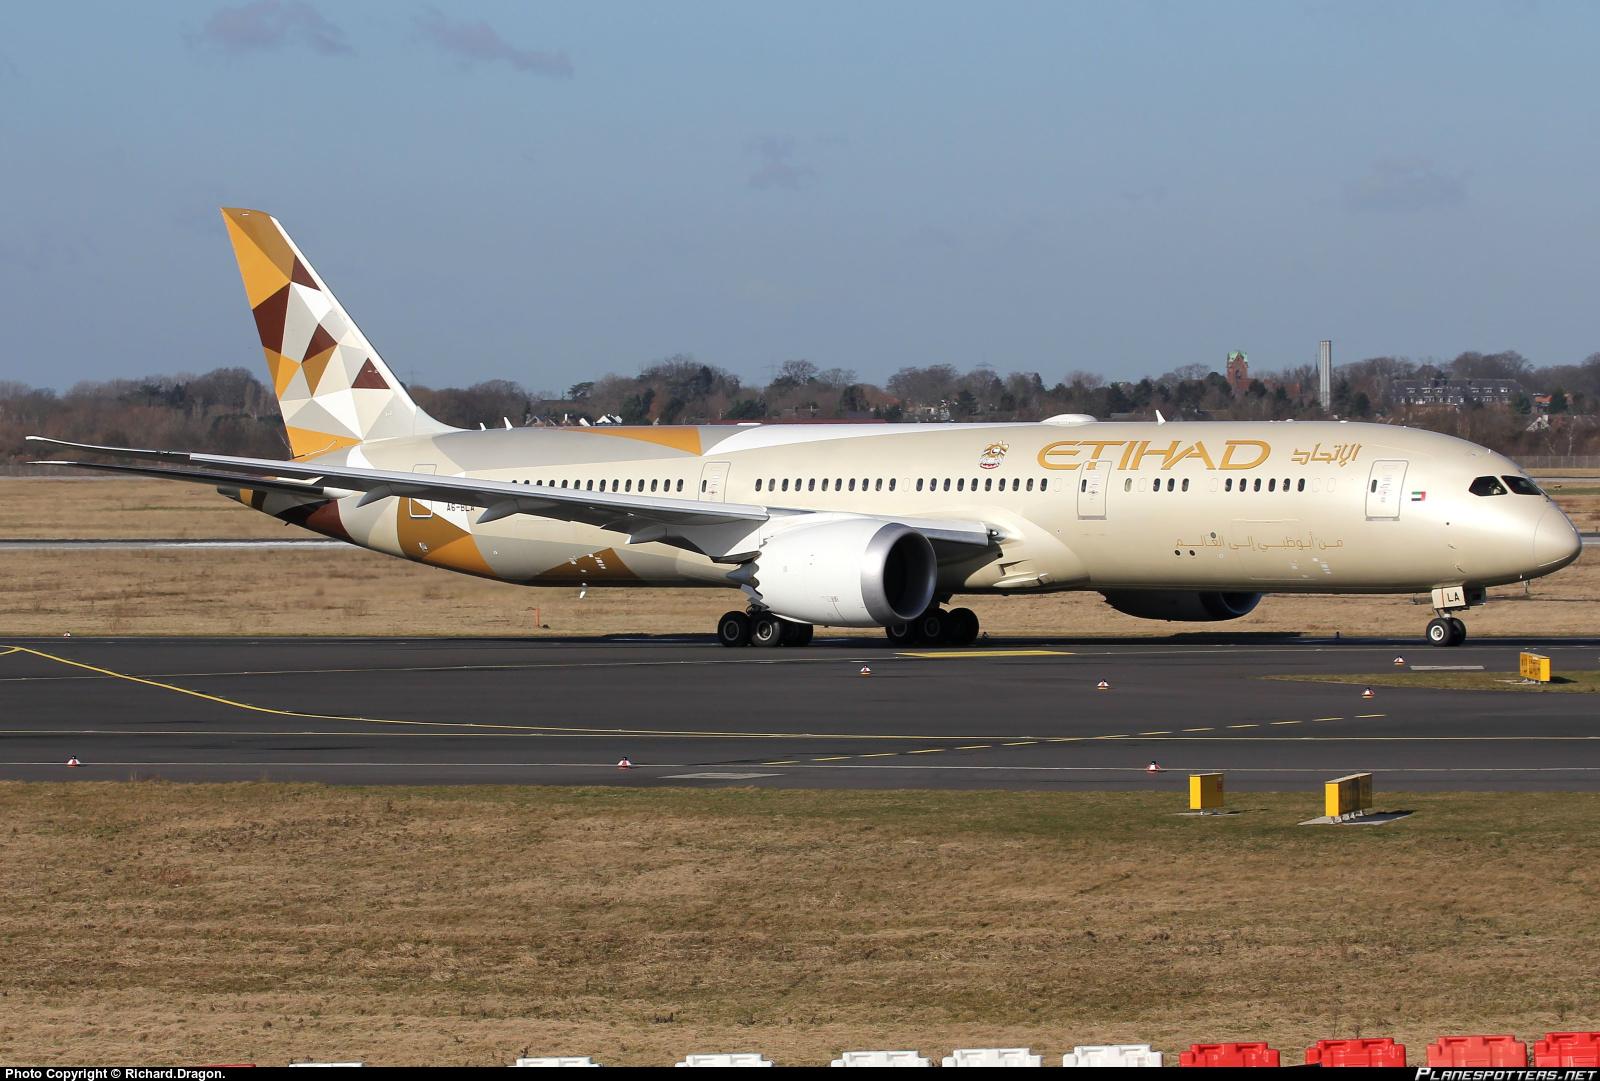 a6-bla-etihad-airways-boeing-787-9-dreamliner_PlanespottersNet_582023